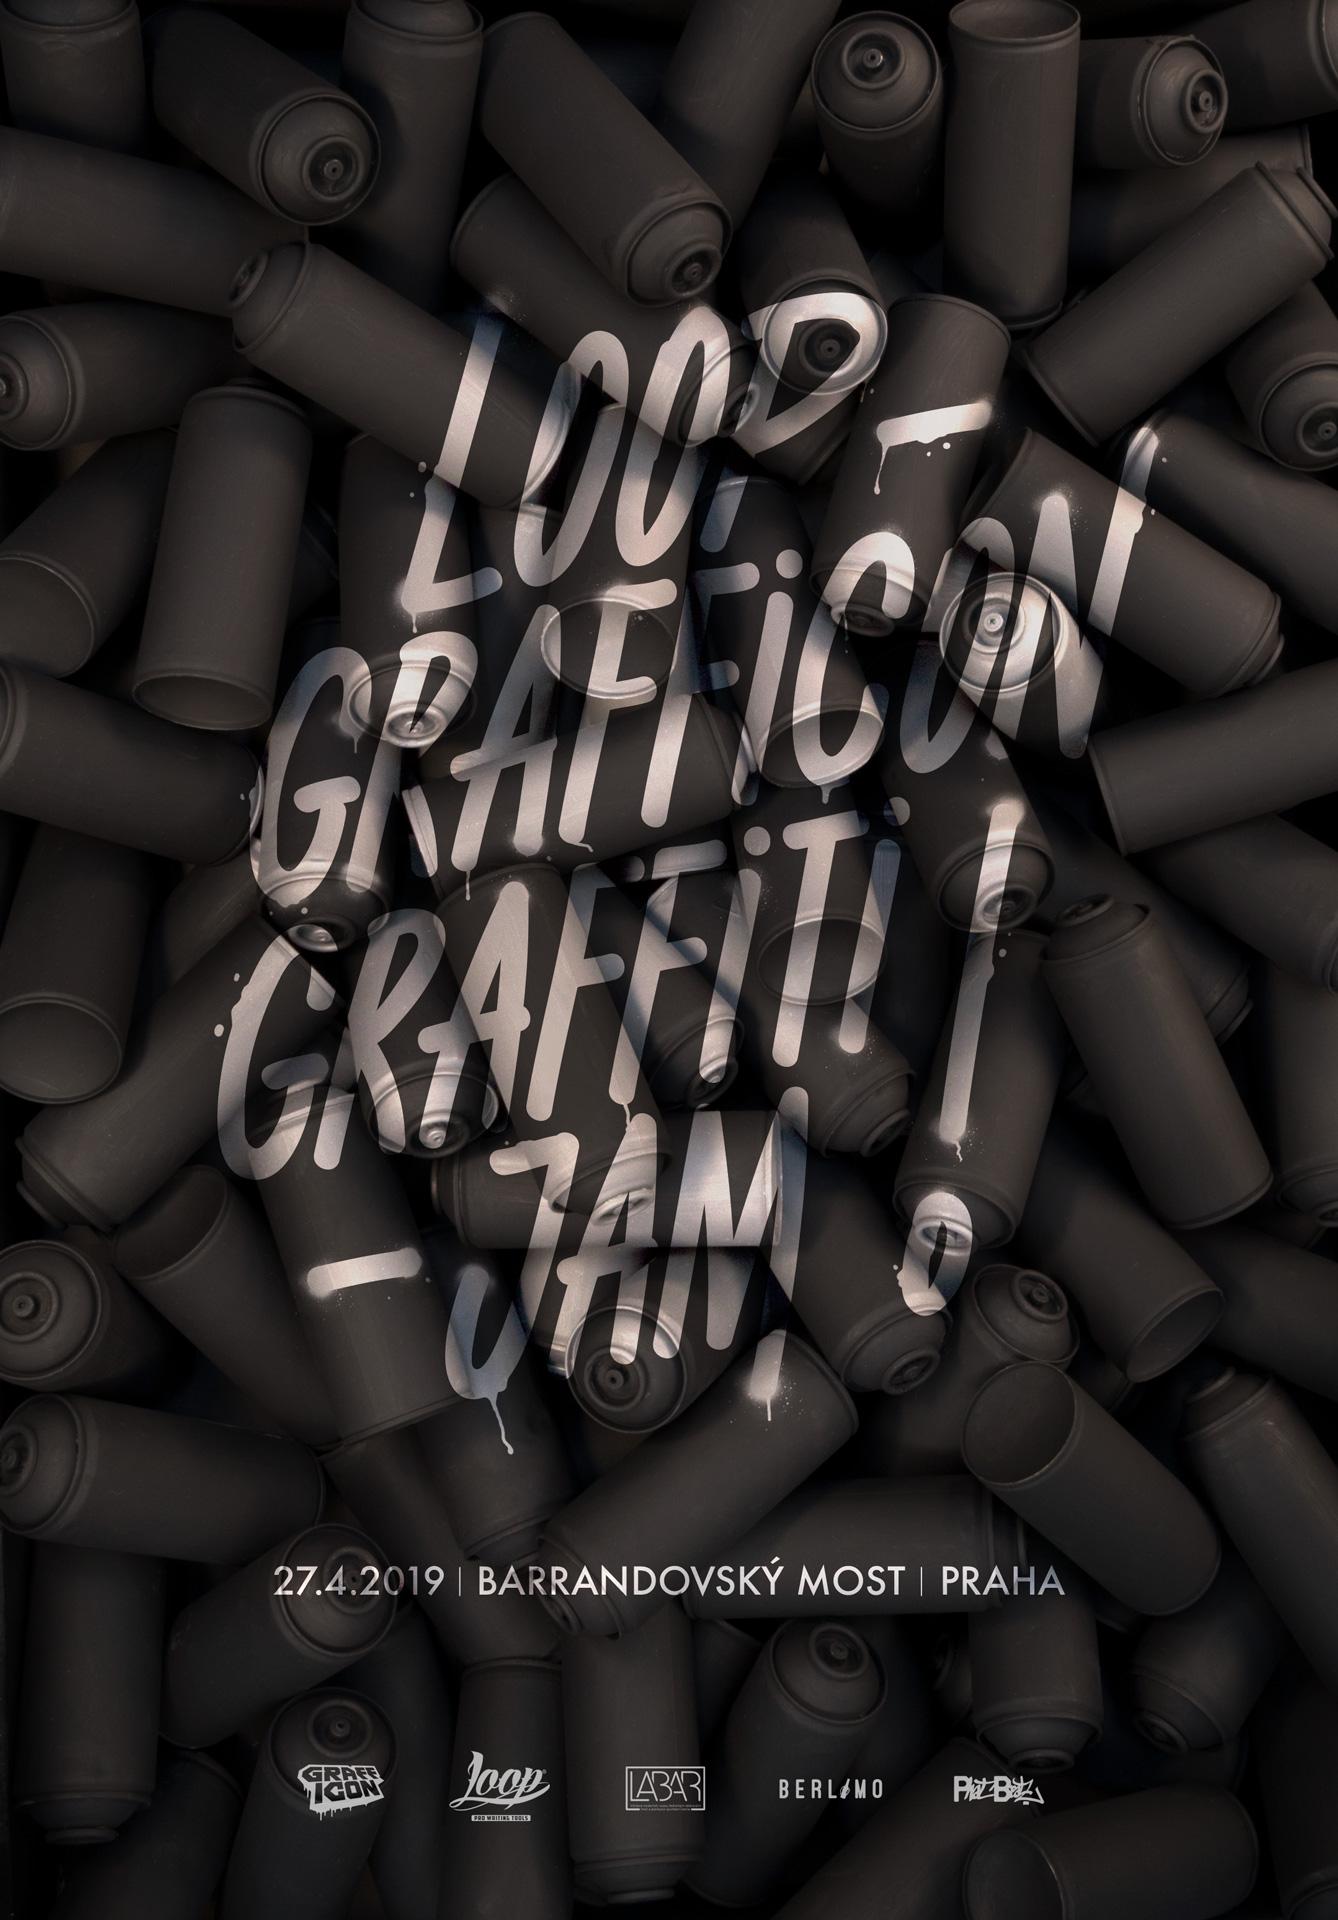 LOOP GRAFFICON GRAFFITI JAM 2019 - Praha